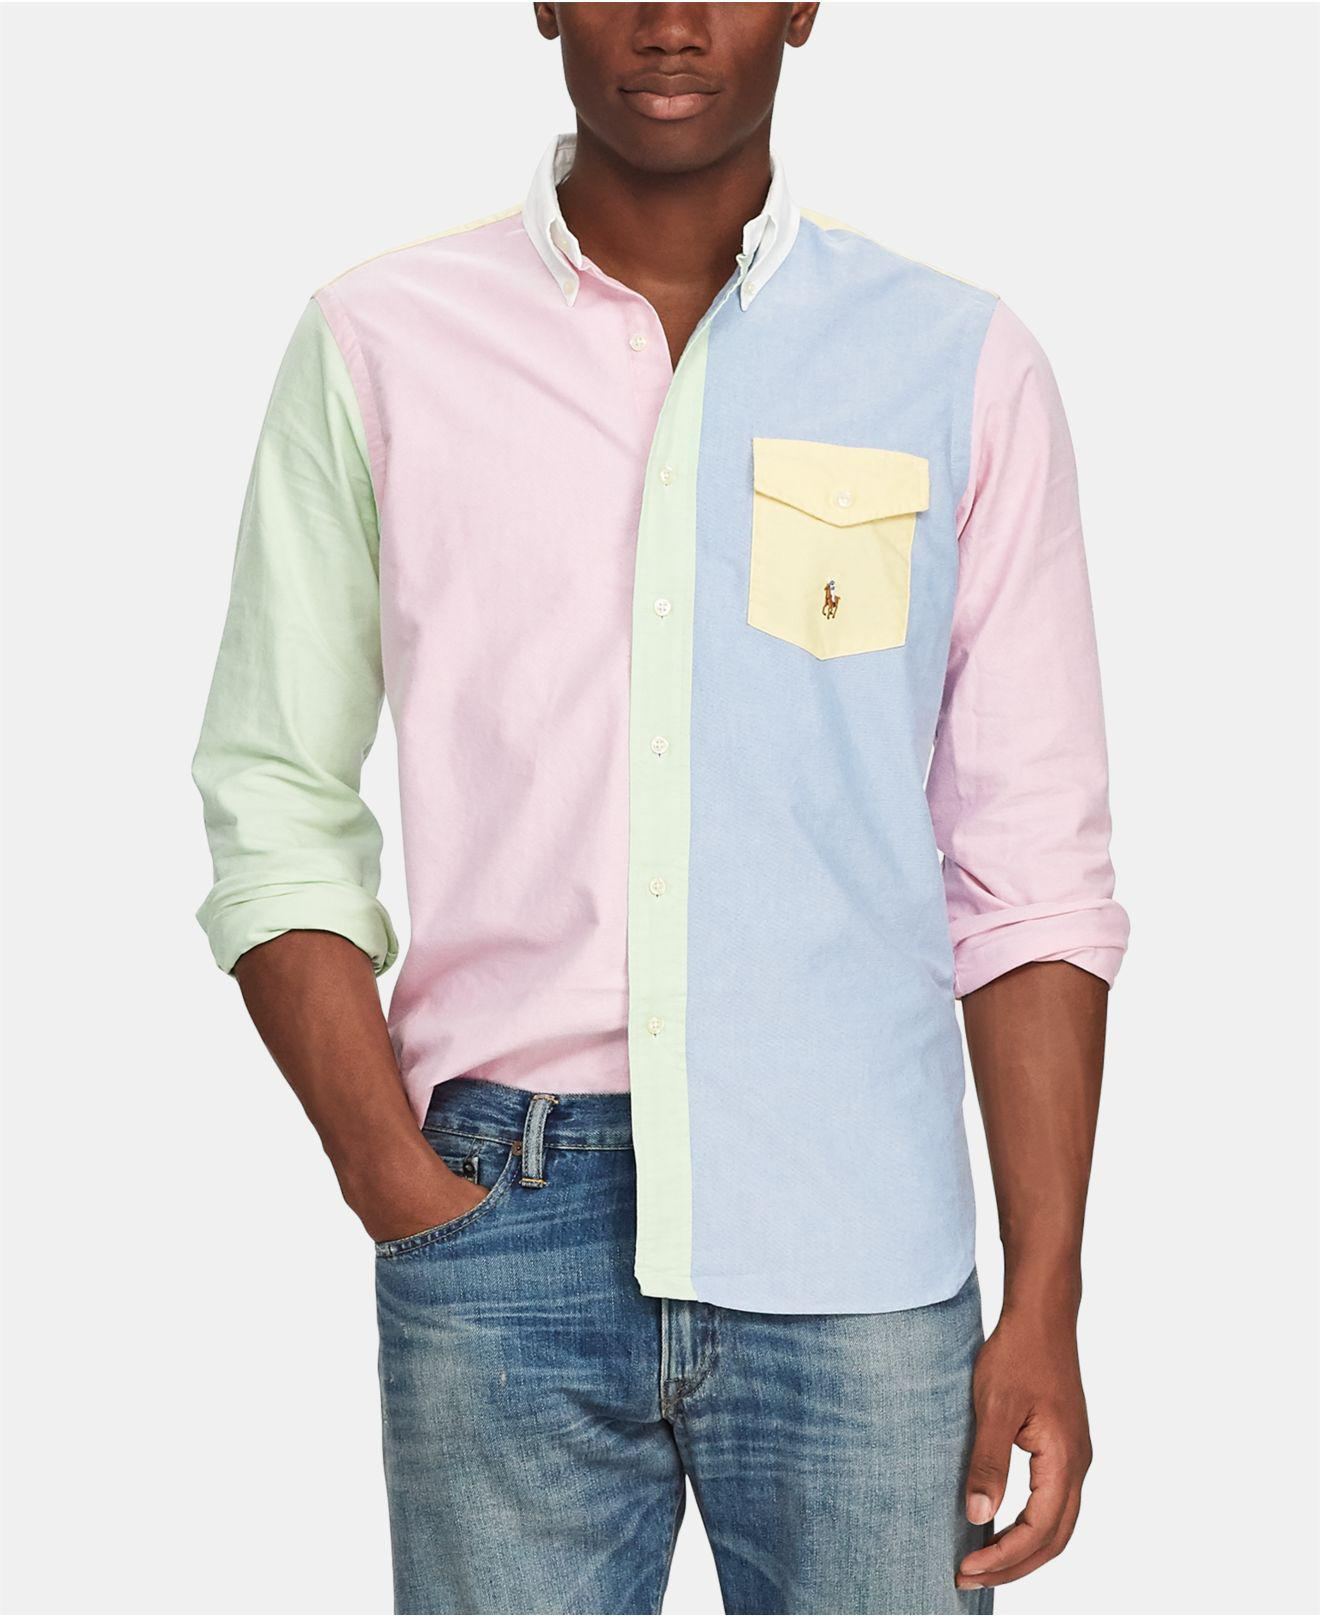 69643e3b328 Lyst - Polo Ralph Lauren Classic Fit Oxford Fun Shirt in Blue for Men